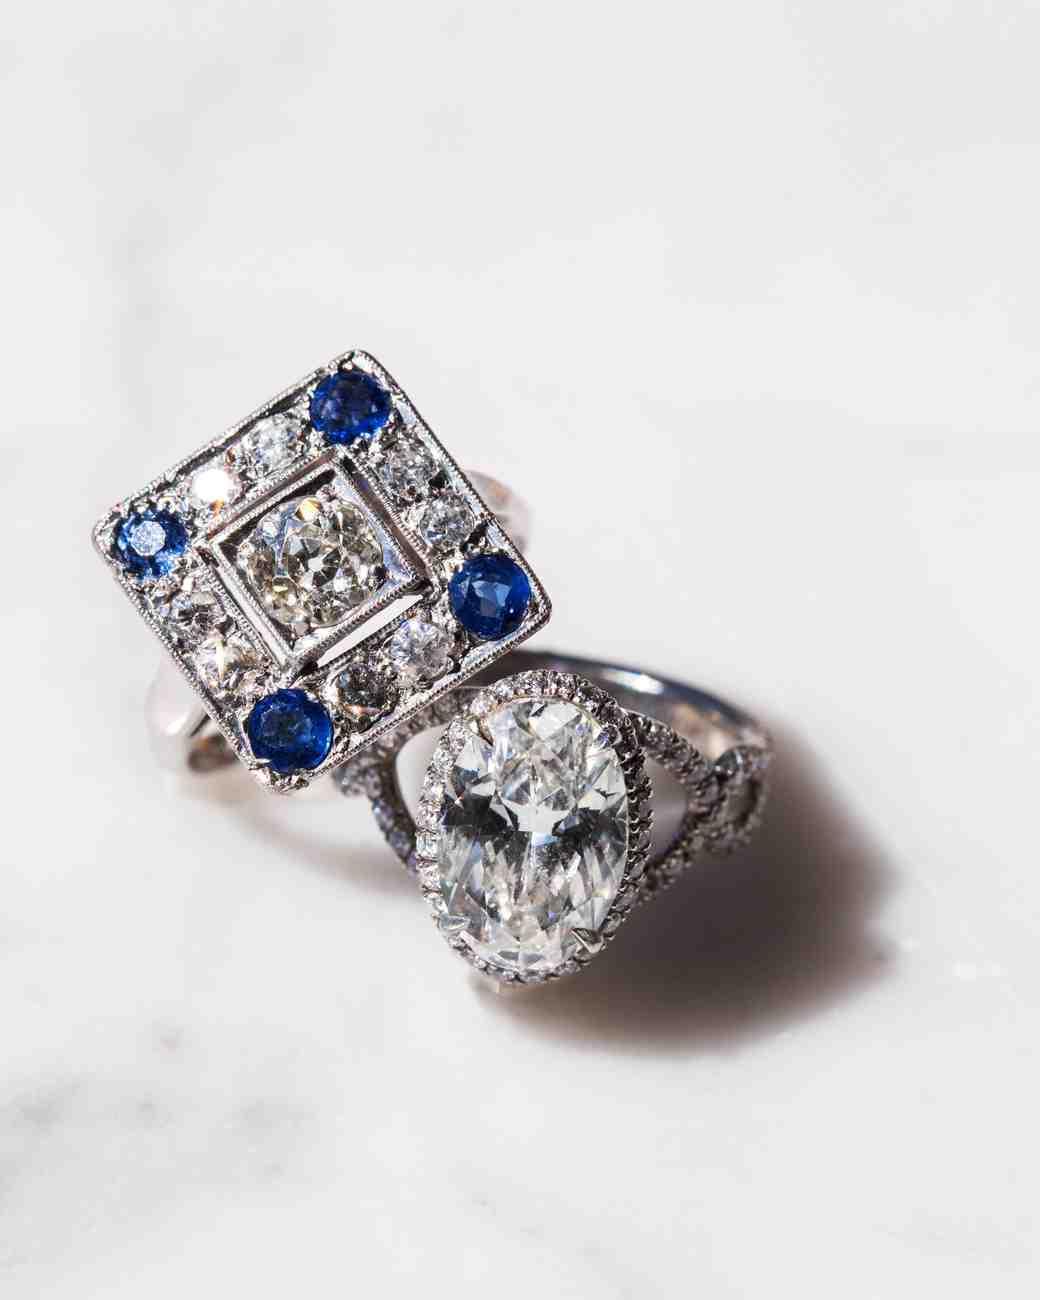 emily-josh-wedding-rings-0006-s112719-0216.jpg